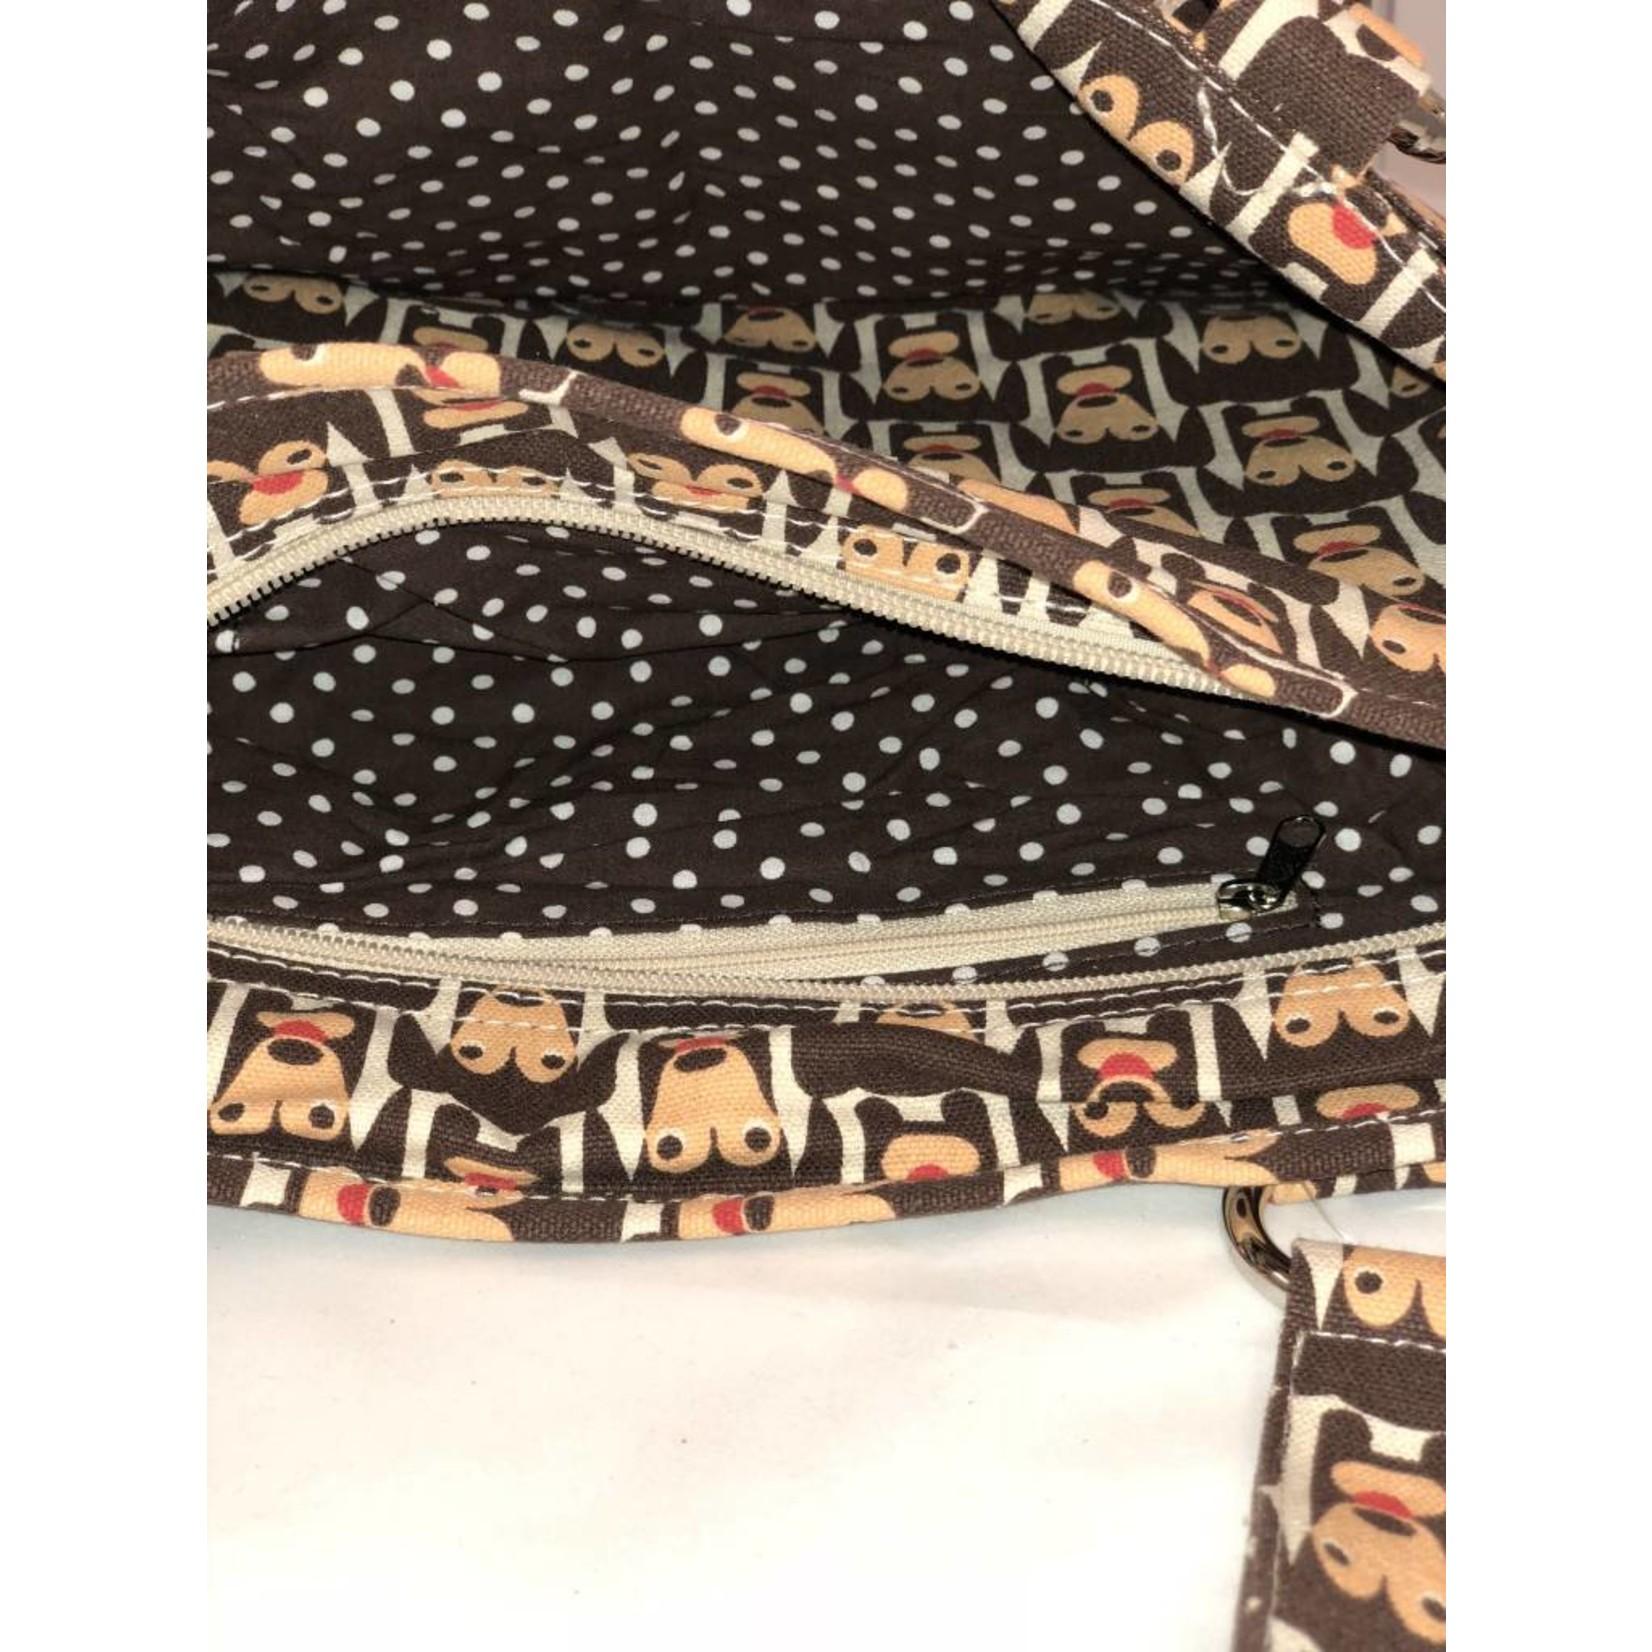 Bungalow 360 Pocket Bag - Happy Dog